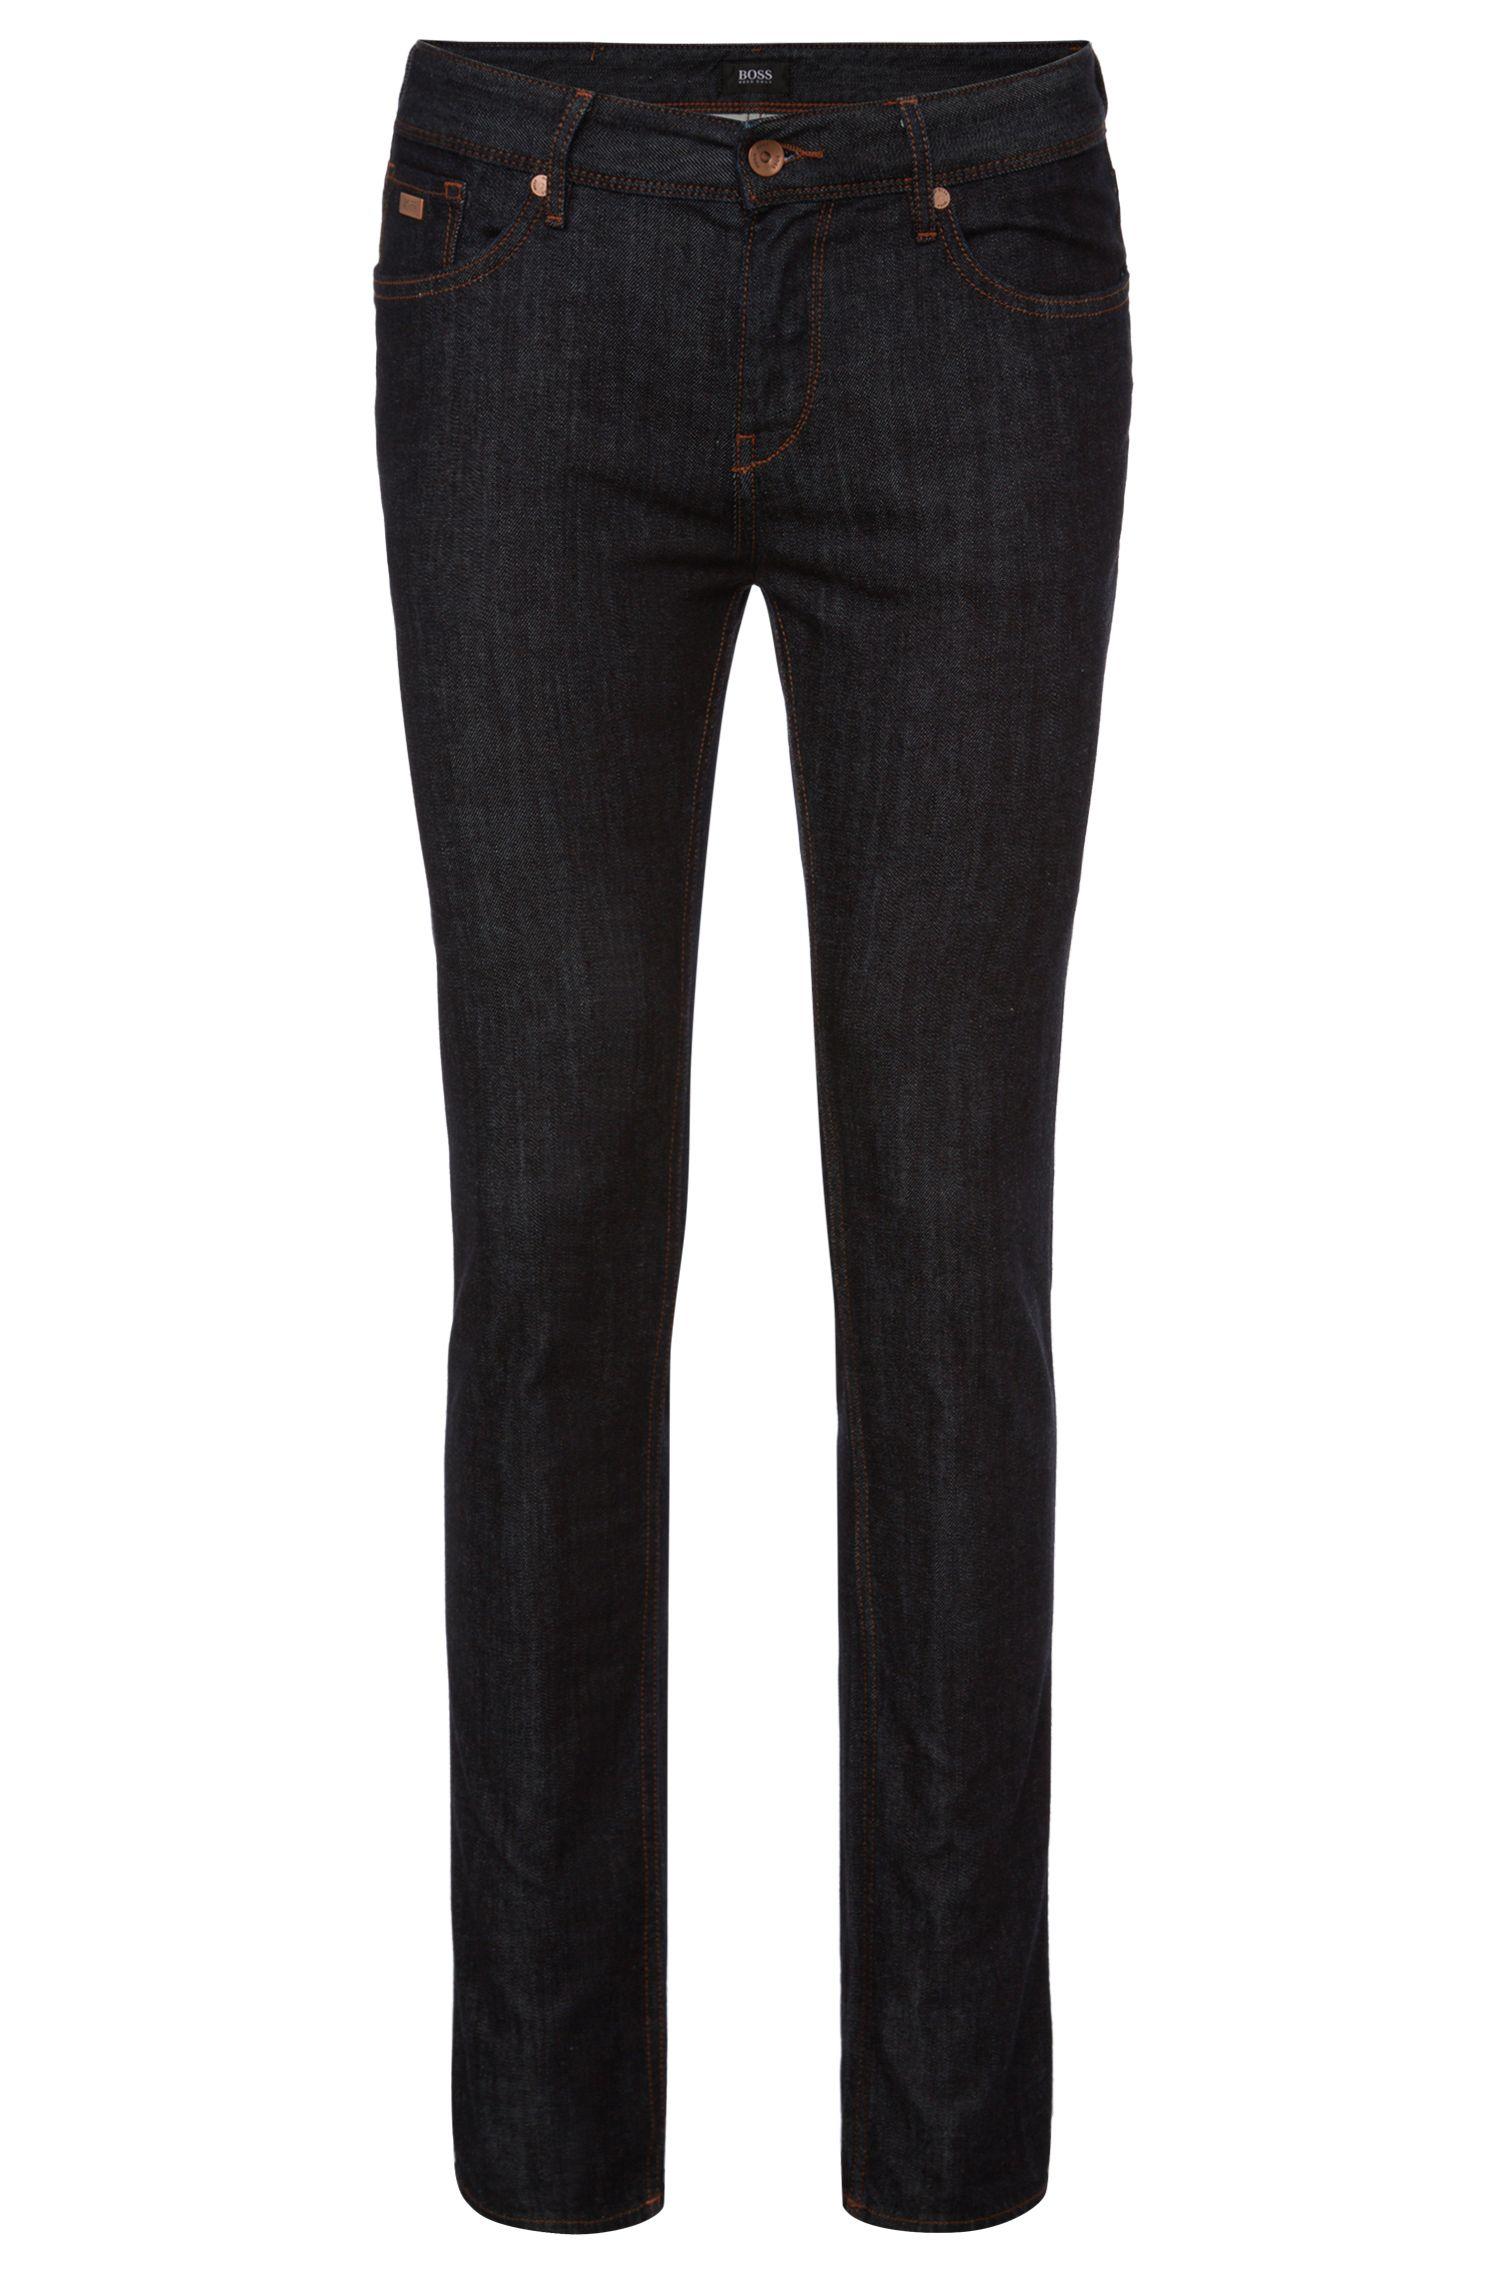 'Charleston'   Extra Slim Fit,  10 oz Stretch Cotton Jeans